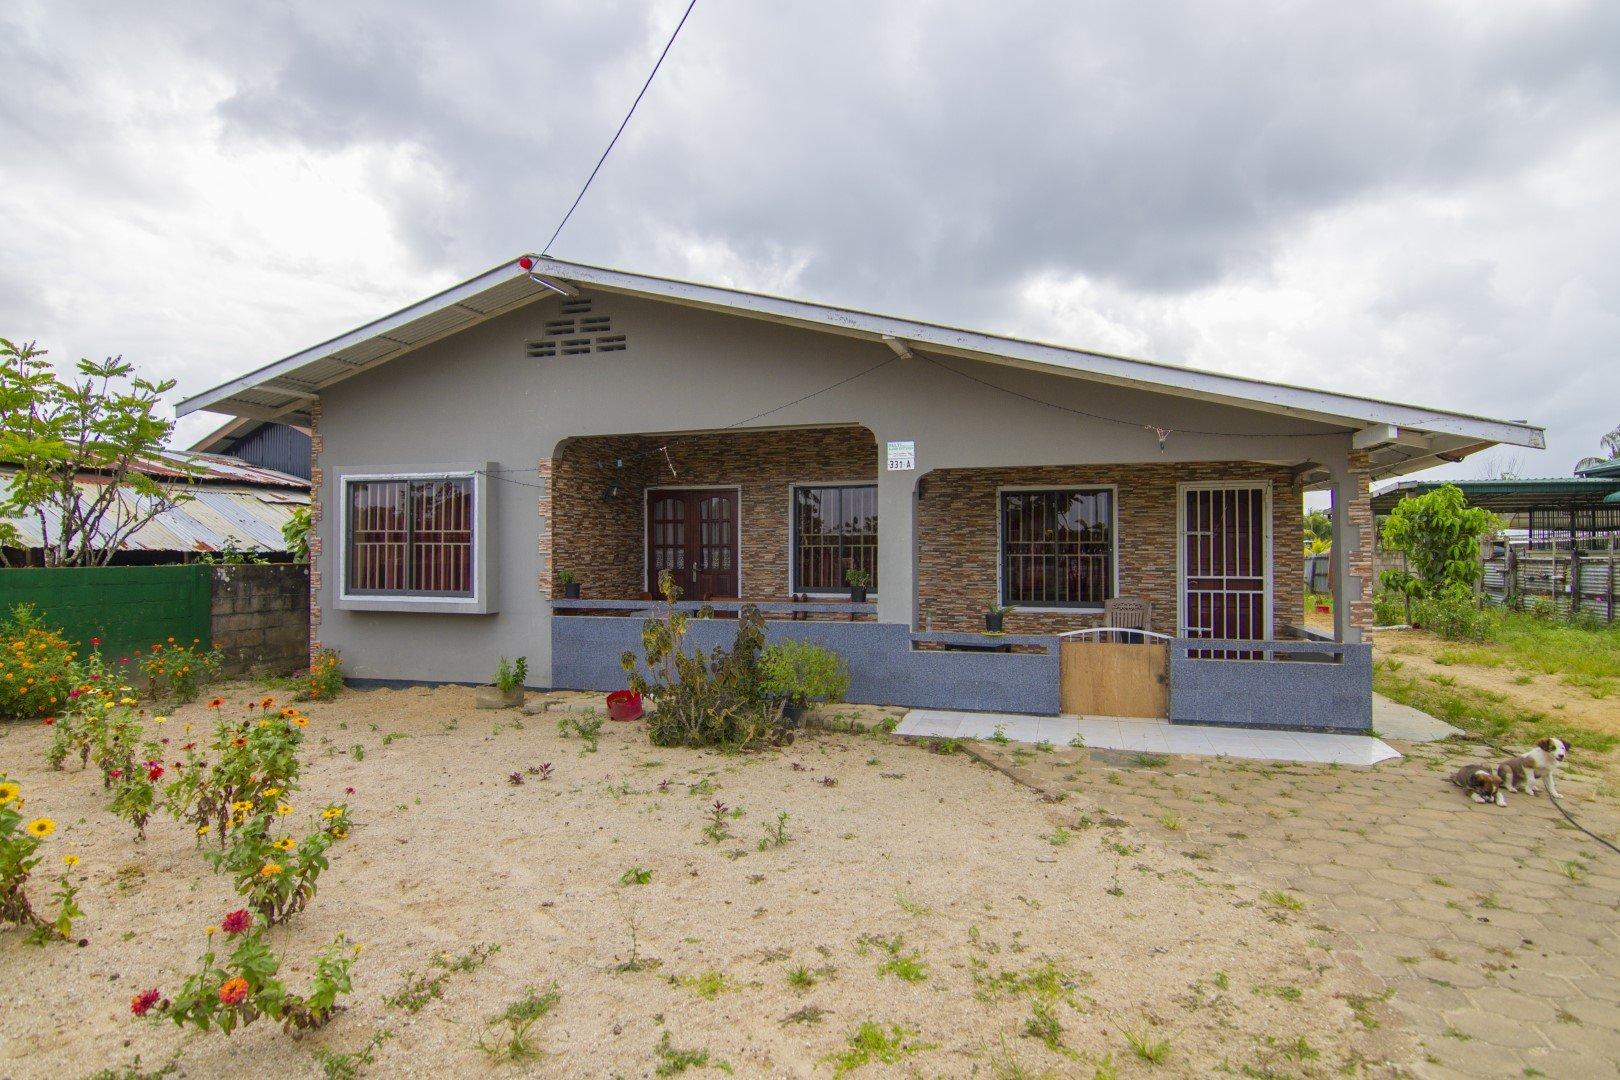 Chandisawweg 331a Uitvlugt Paramaribo Surgoed Makelaardij NV W0640B3 1 300x169 - Chandiesawweg 331a